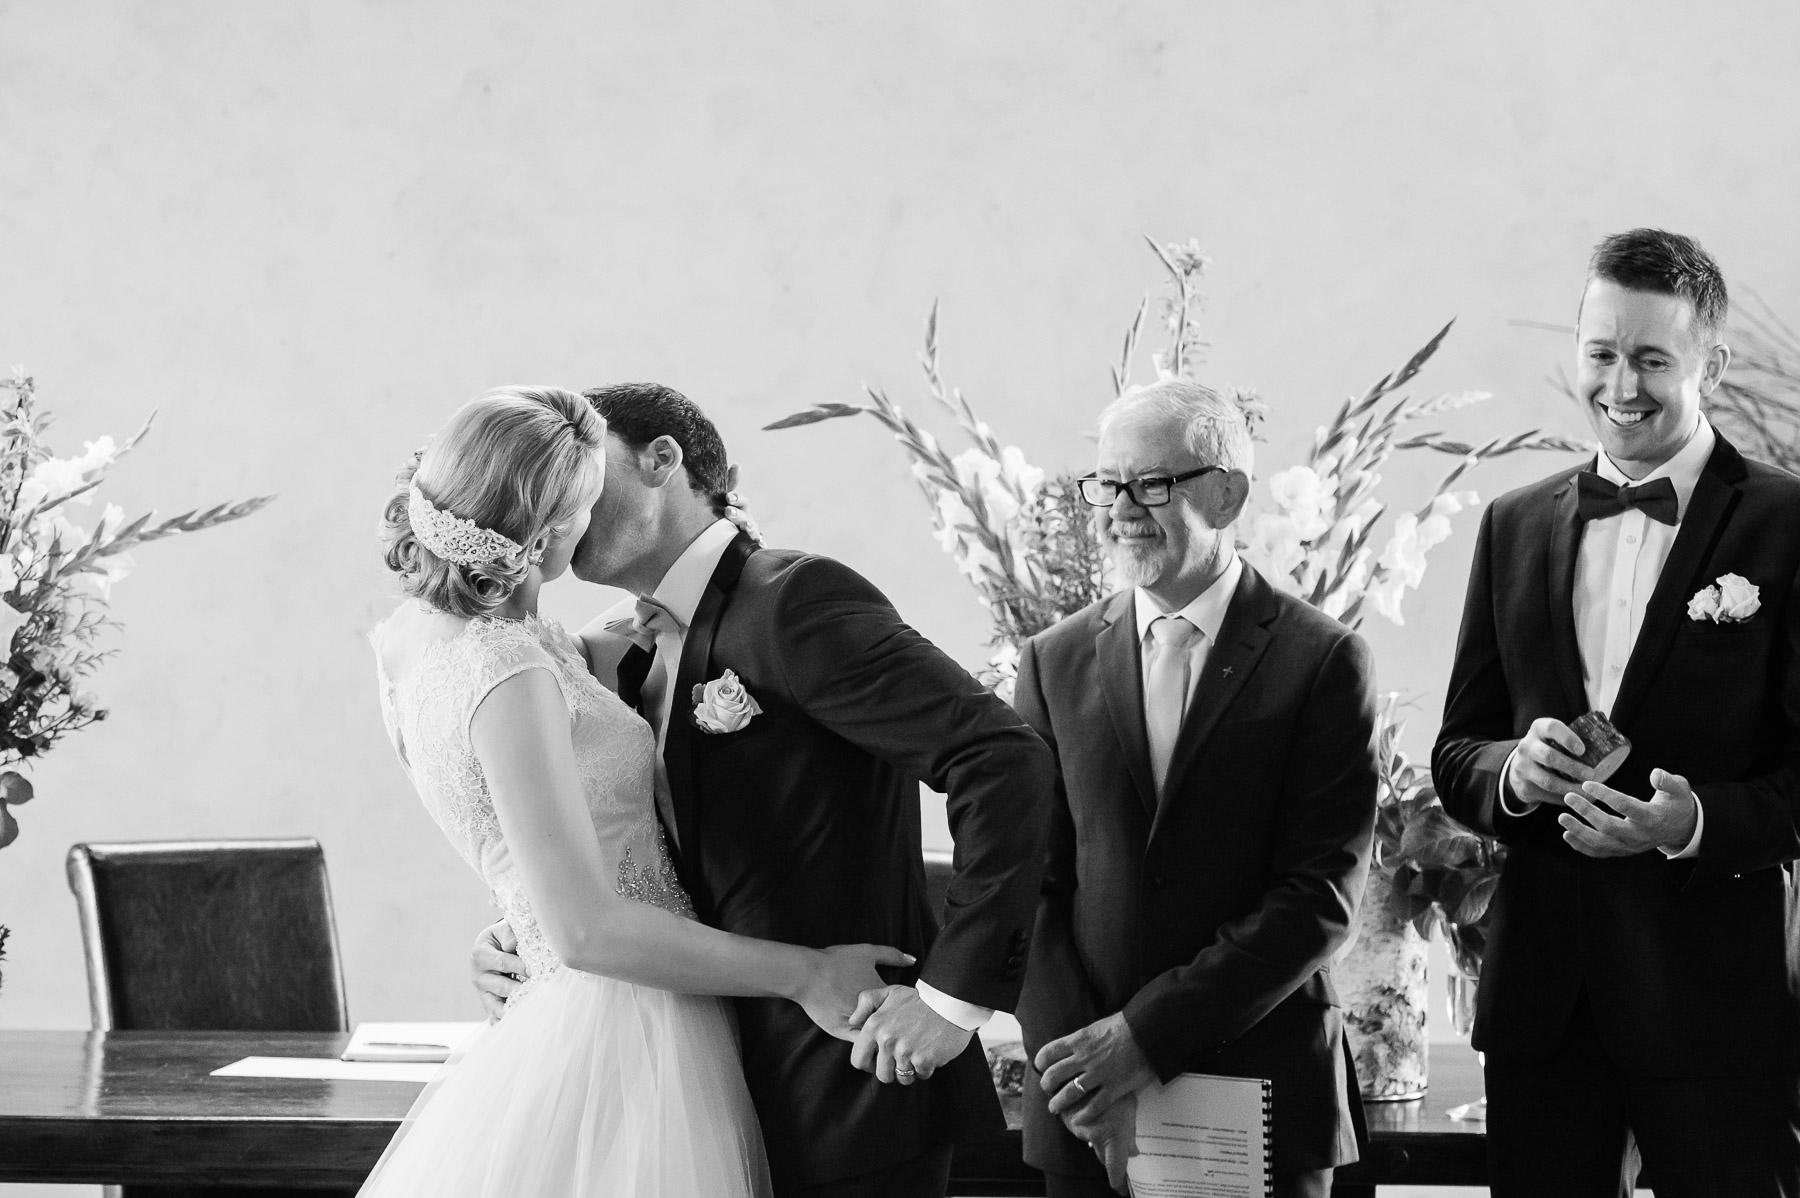 Marnie_and_Charlie_Yarra_Valley_Wedding_Blog-48.jpg